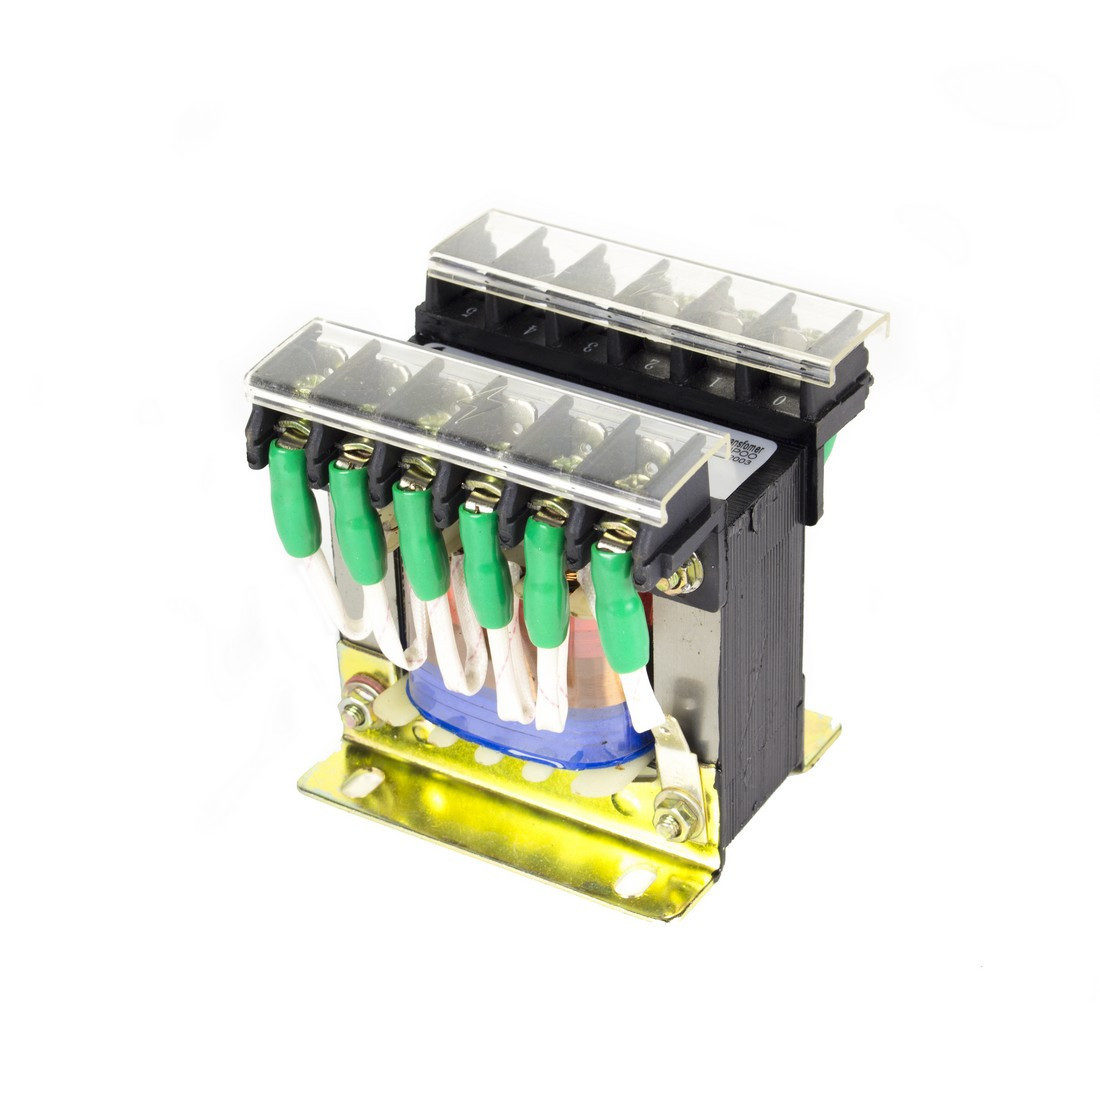 Трансформатор понижающий iPower JBK3-630 VA - фото 1